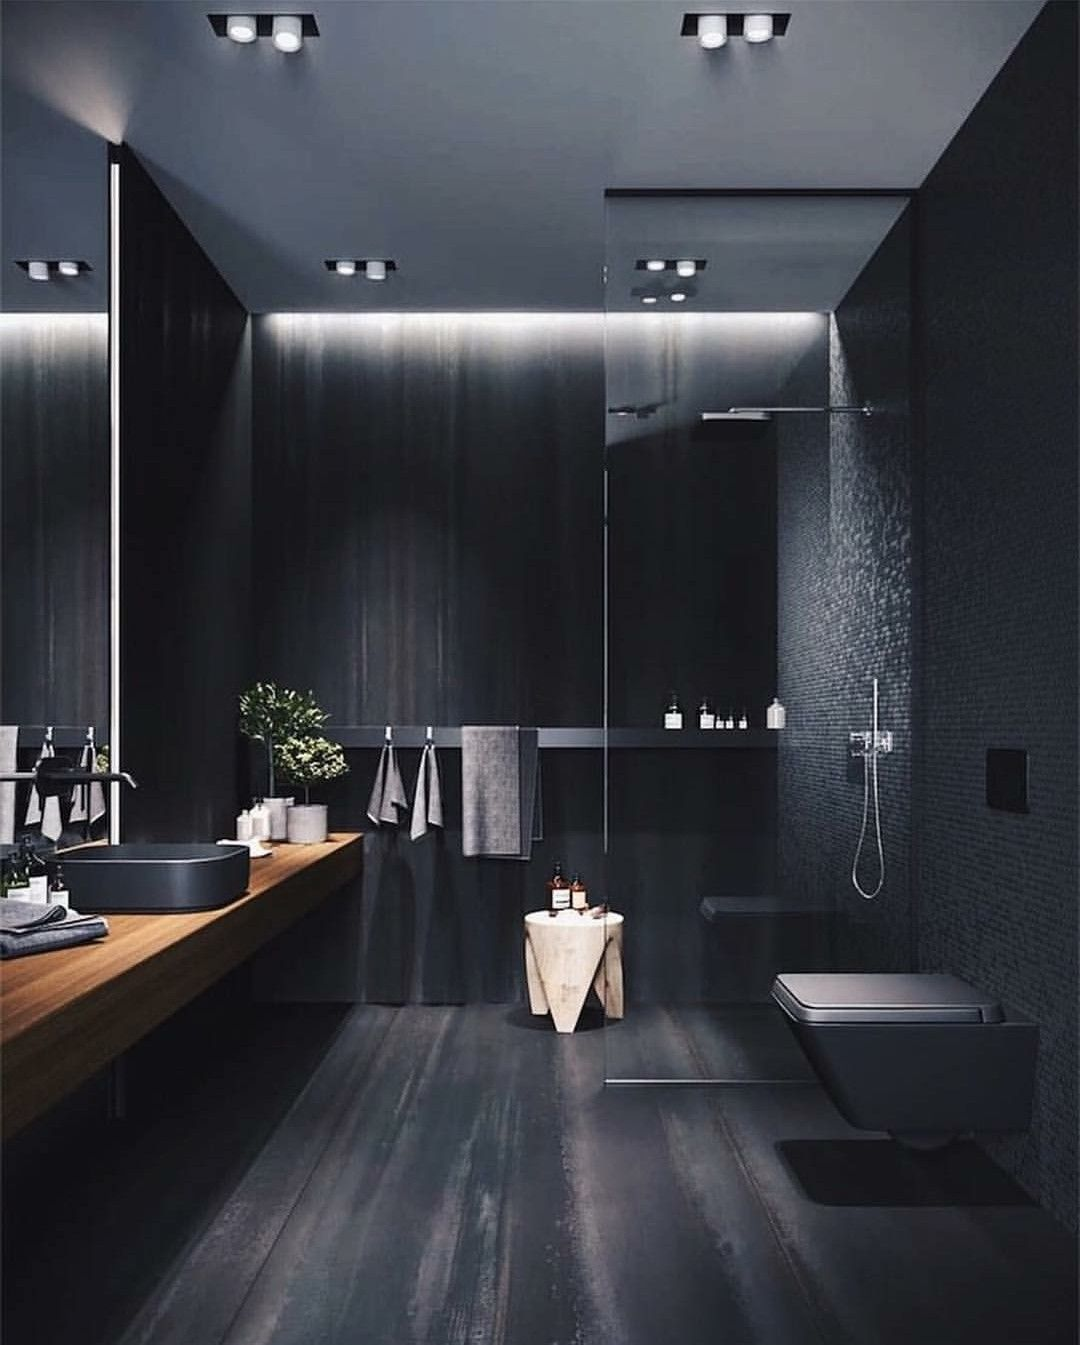 Peinture Pour Wc Ceramique sooooo dark & masculine! | idée salle de bain, salle de